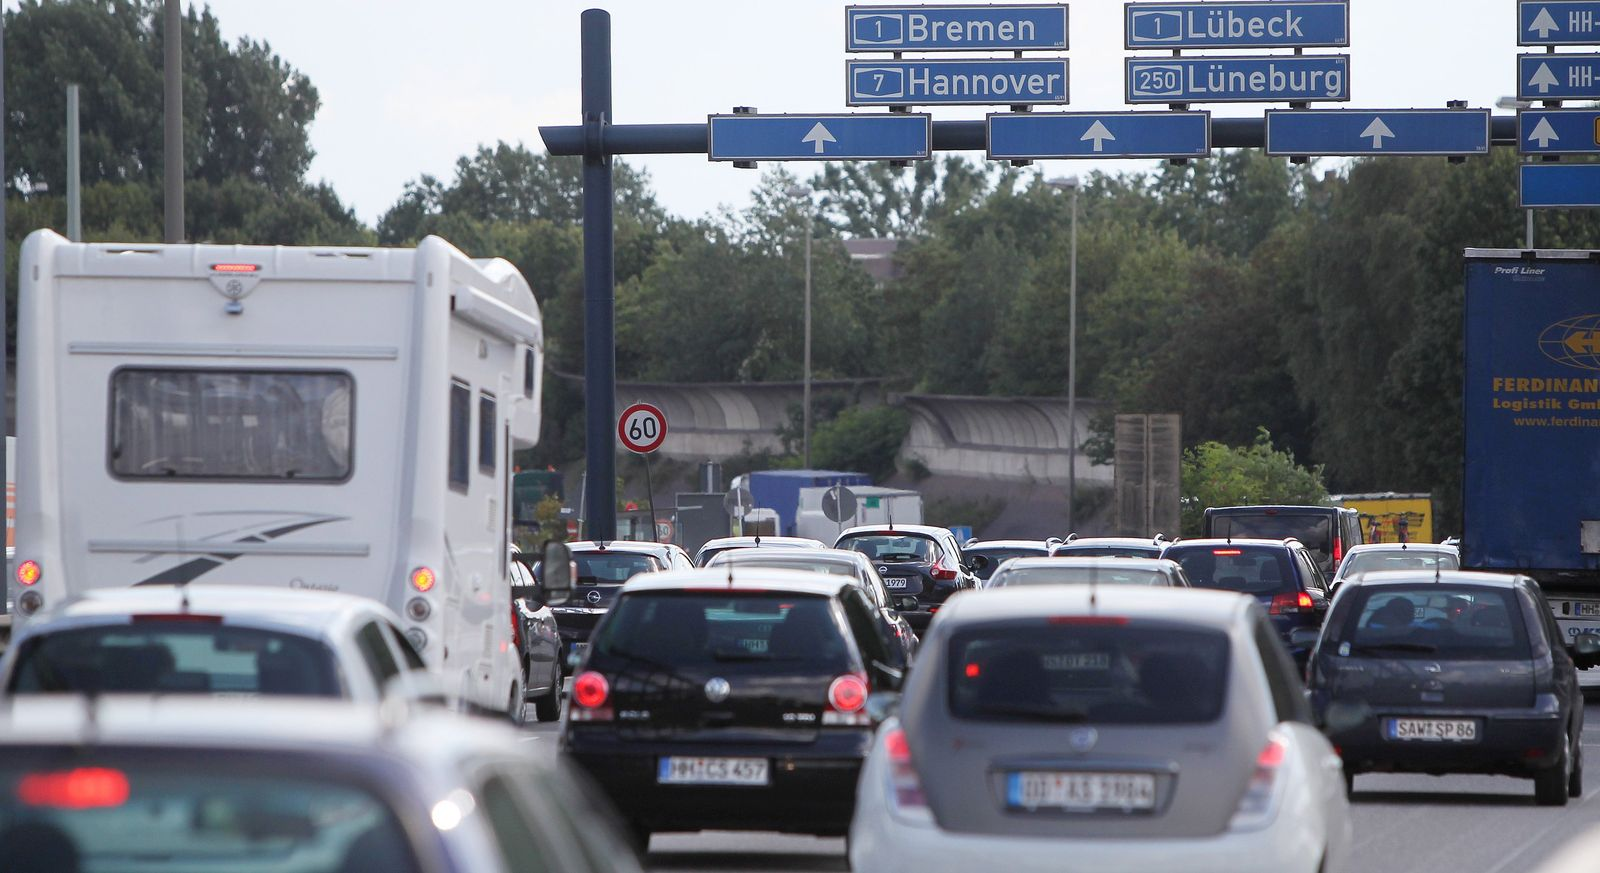 Autobahn Germany cars